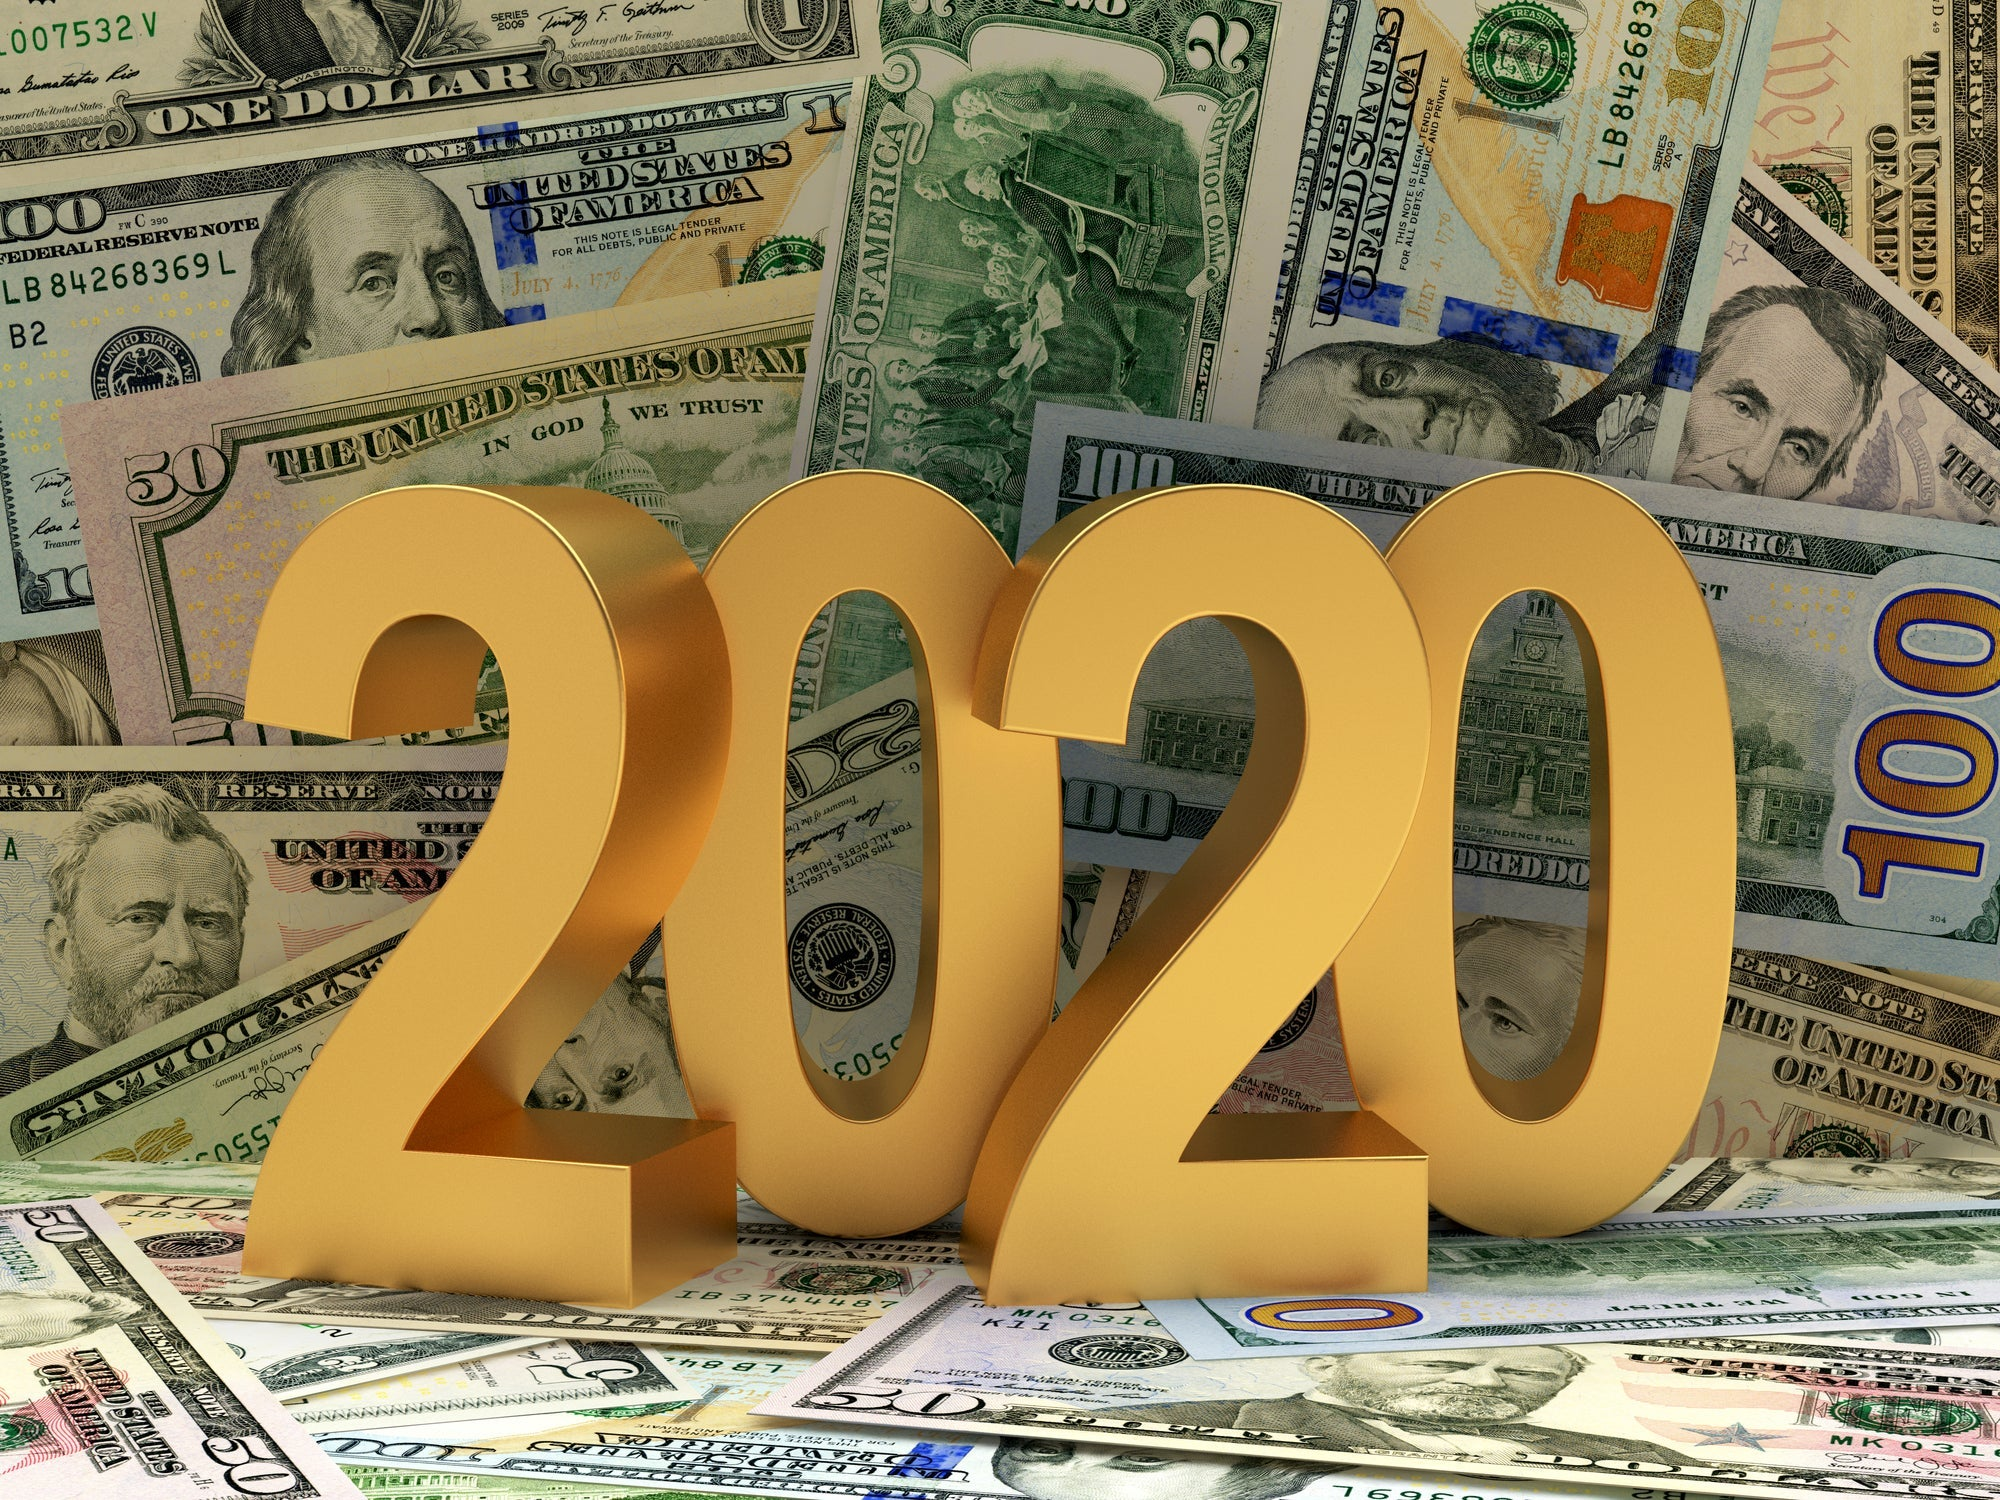 3 Top Stocks To Watch This Year Rick Munarriz | Sep 22, 2020